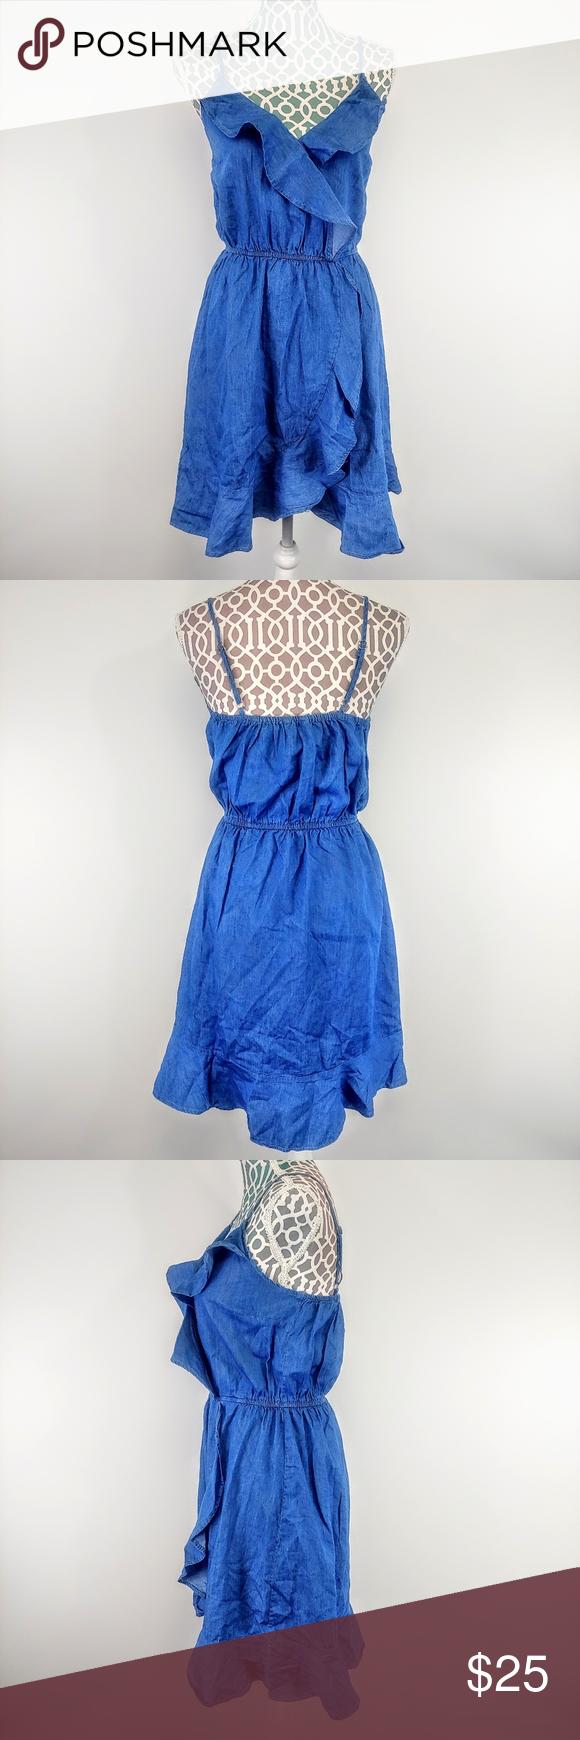 Ruffled Denim Apron Dress By Flow The Label Ripped Dress Denim Ruffle Dress Flutter Sleeve Dress [ 1807 x 1128 Pixel ]